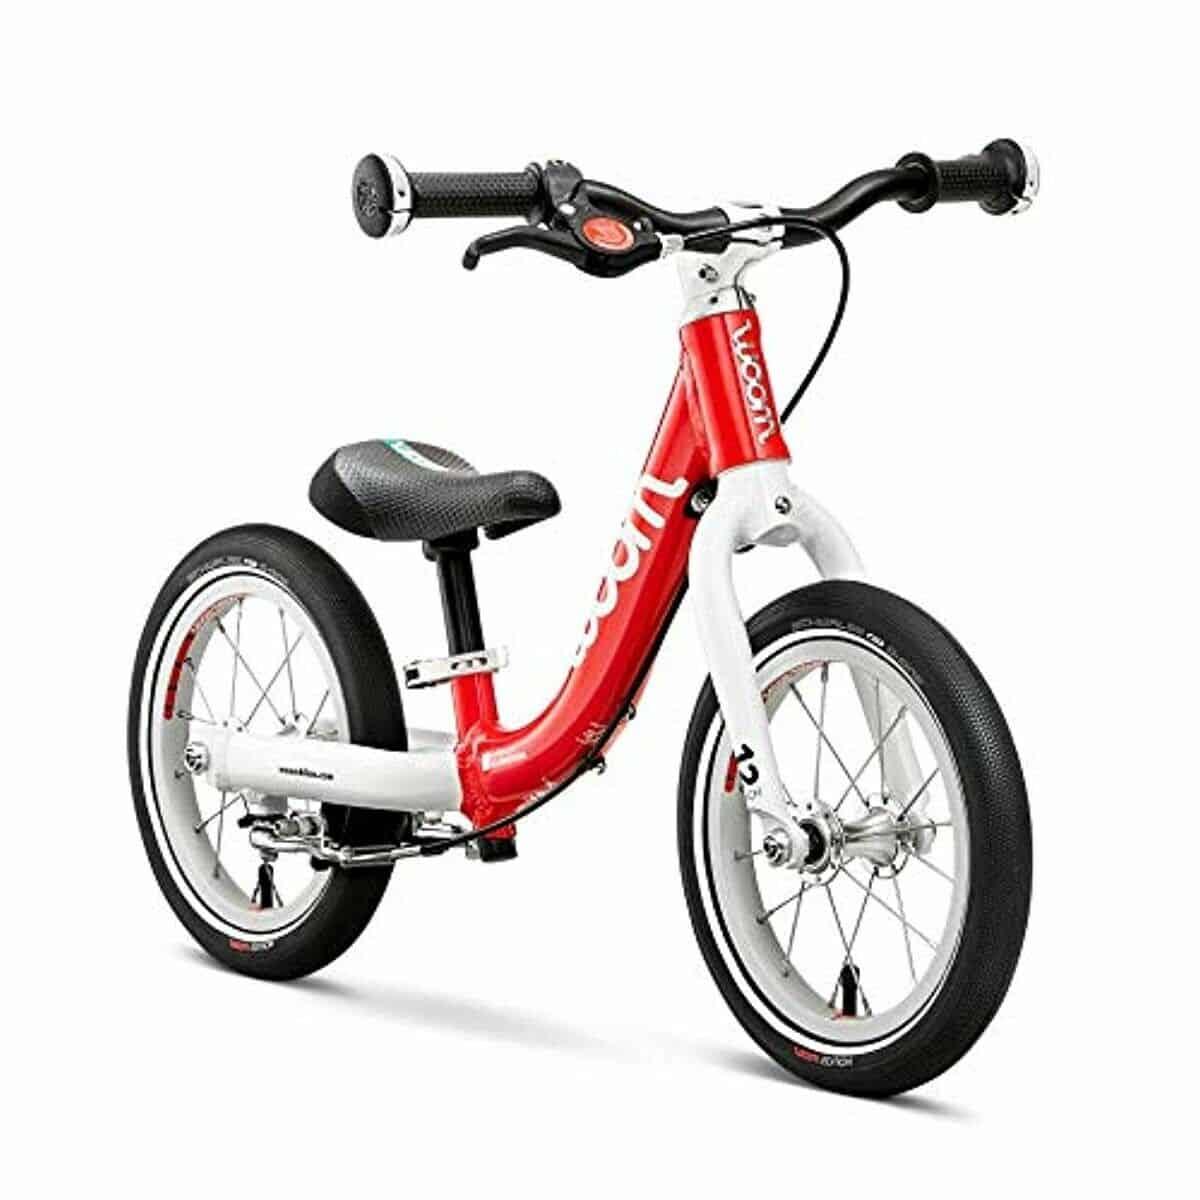 "WOOM BIKES USA Woom 1 Balance Bike 12"""